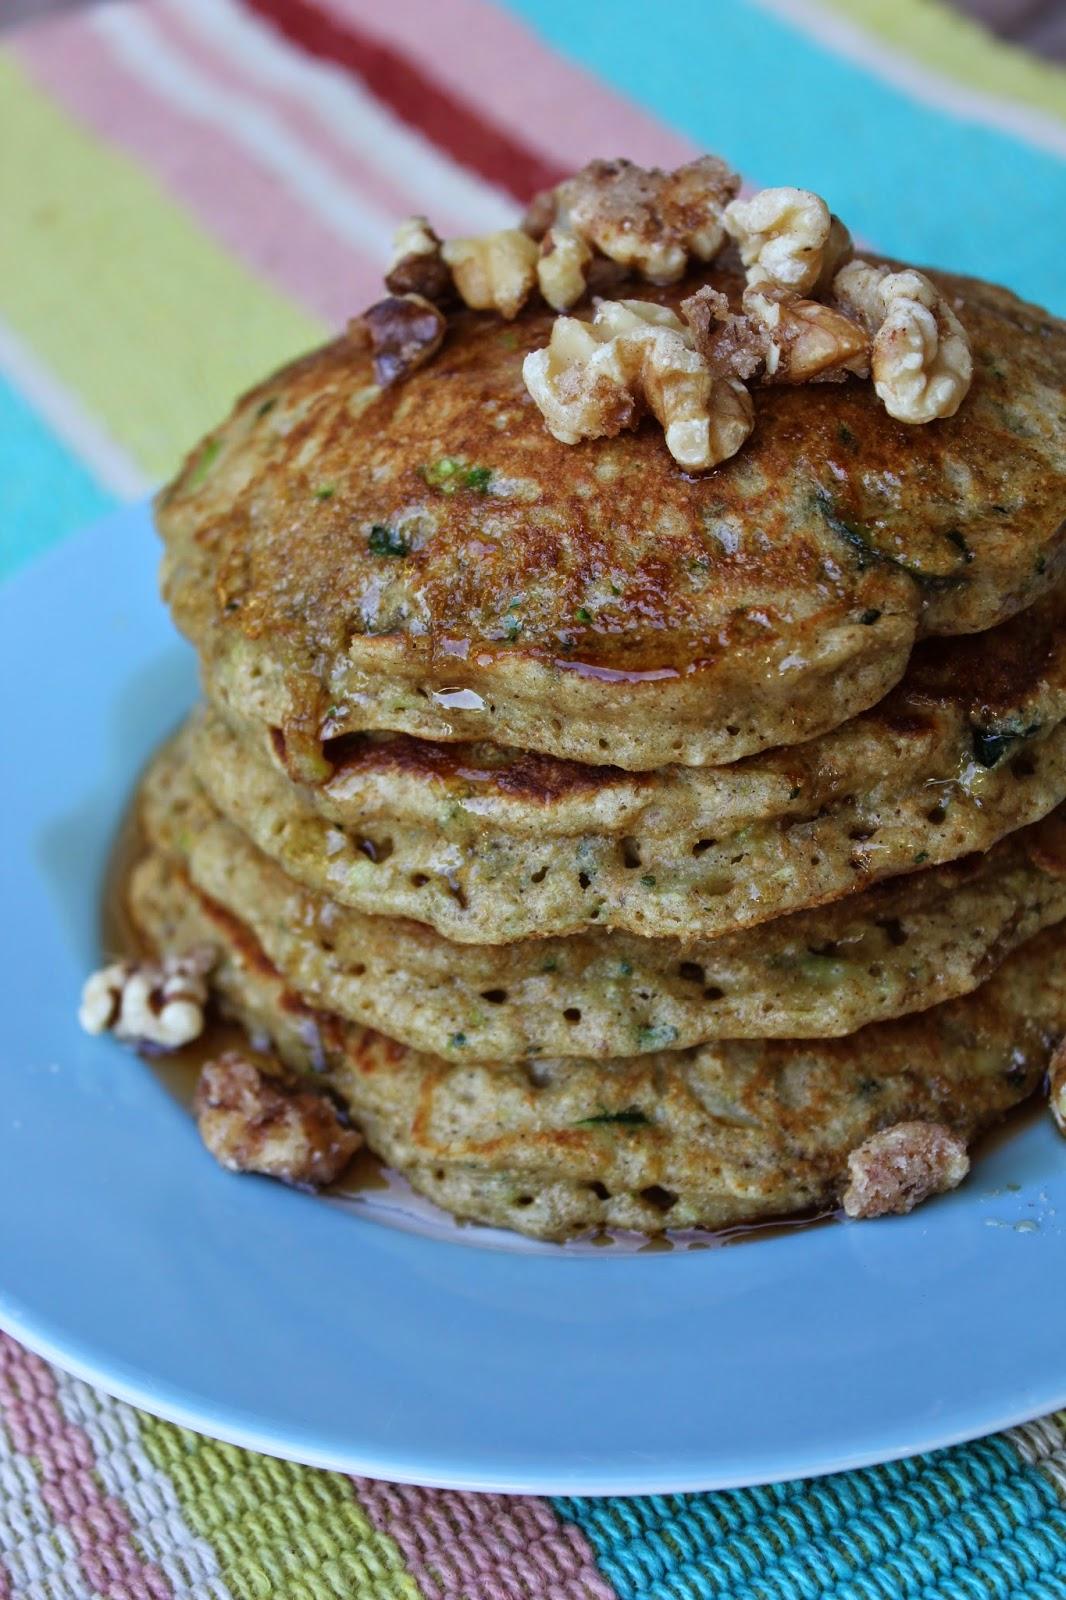 Recipe:  Breakfast, Garden Recipes, Recipe:  Food Storage, Recipe:  Grains, whole grain pancakes, zucchini pancakes, Recipe:  Healthy, Recipe:  Healthy Recipes, Deals to Meals